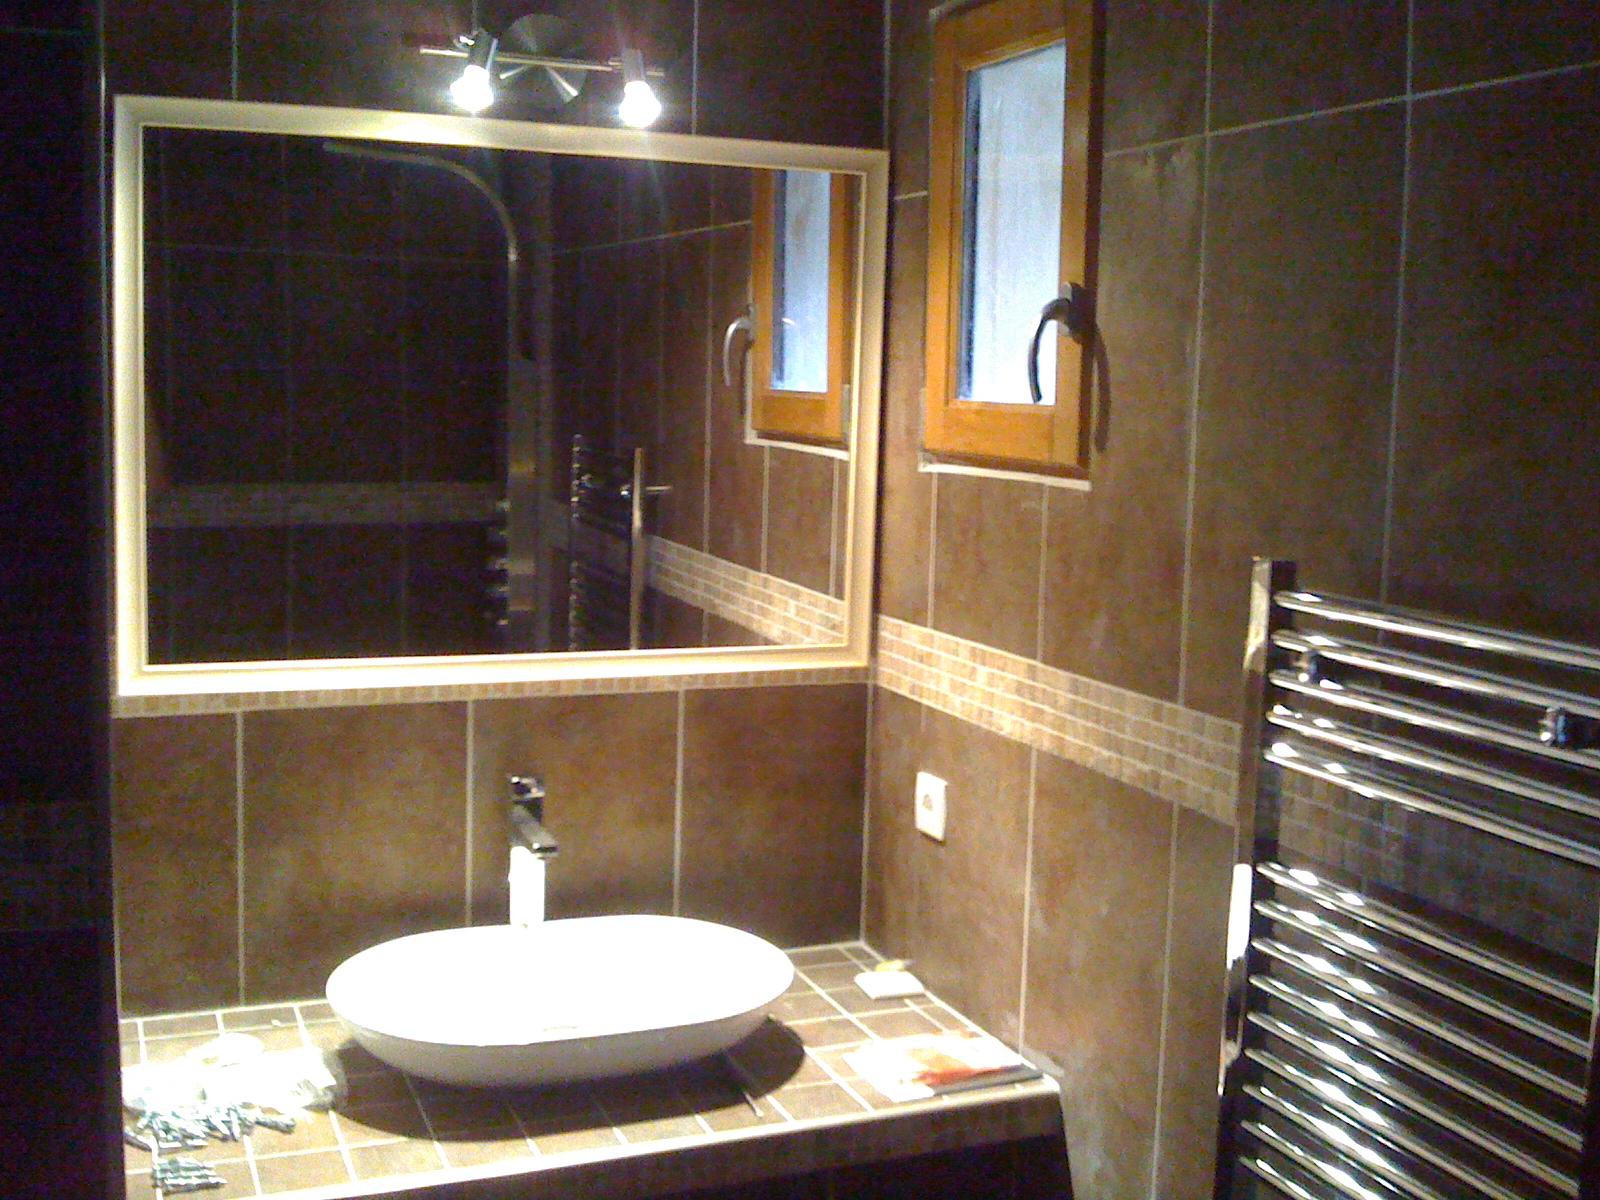 Plan de travail salle de bain en mosaique